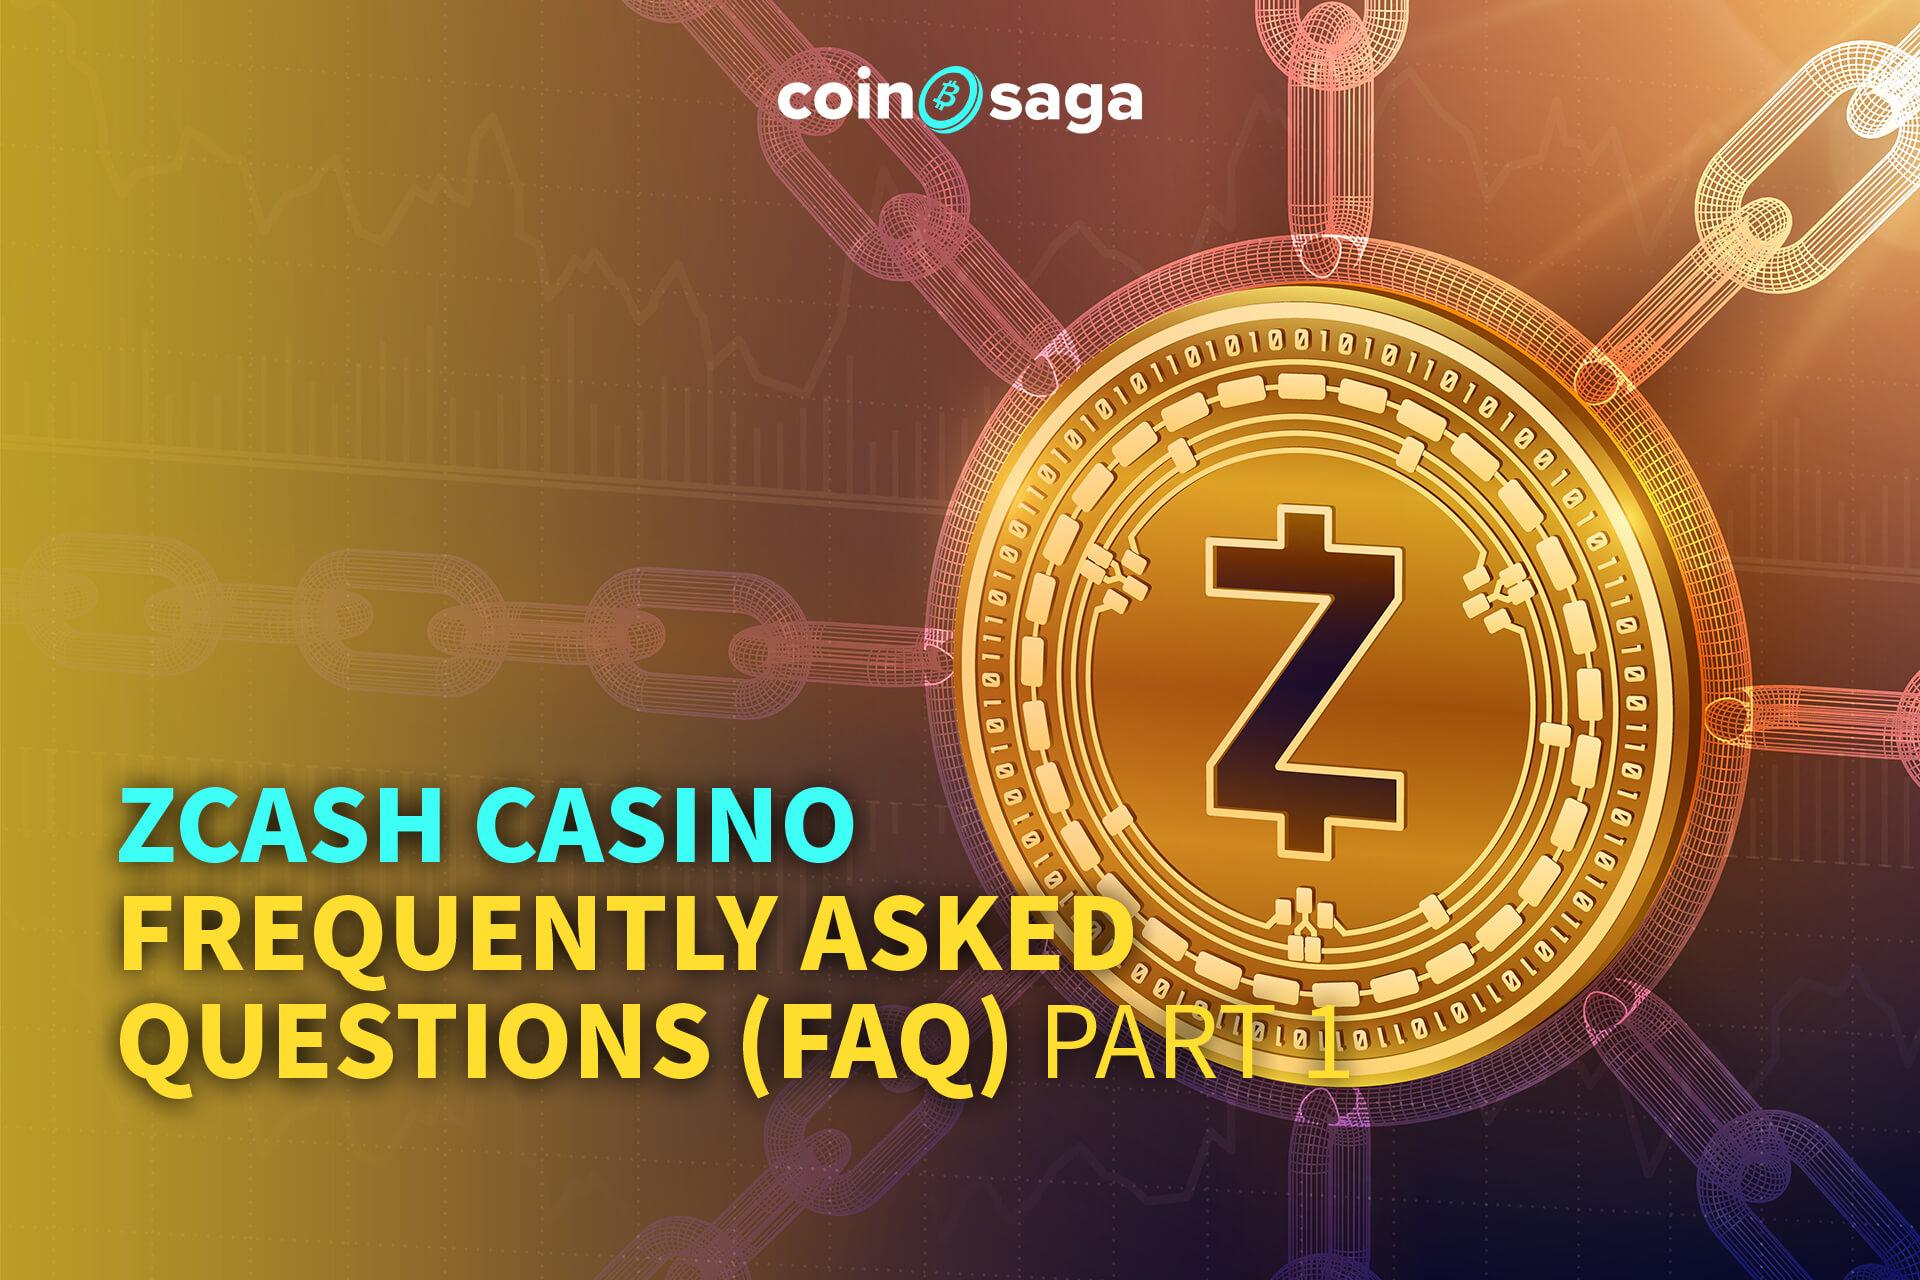 zcash casino faq part 1